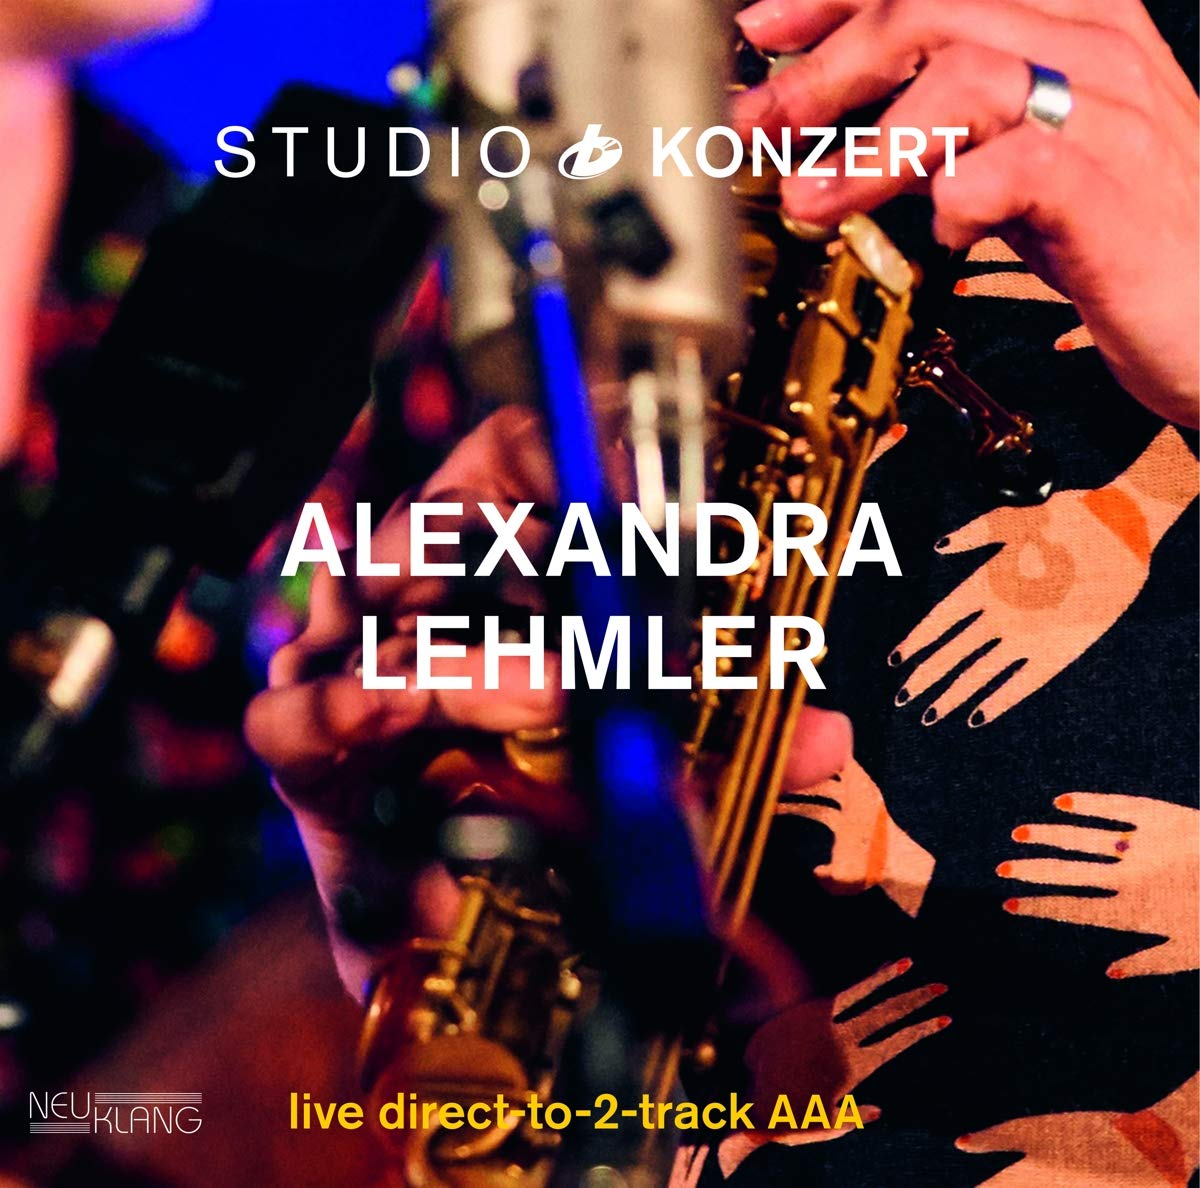 ALEXANDRA LEHMLER - Studio Konzert cover